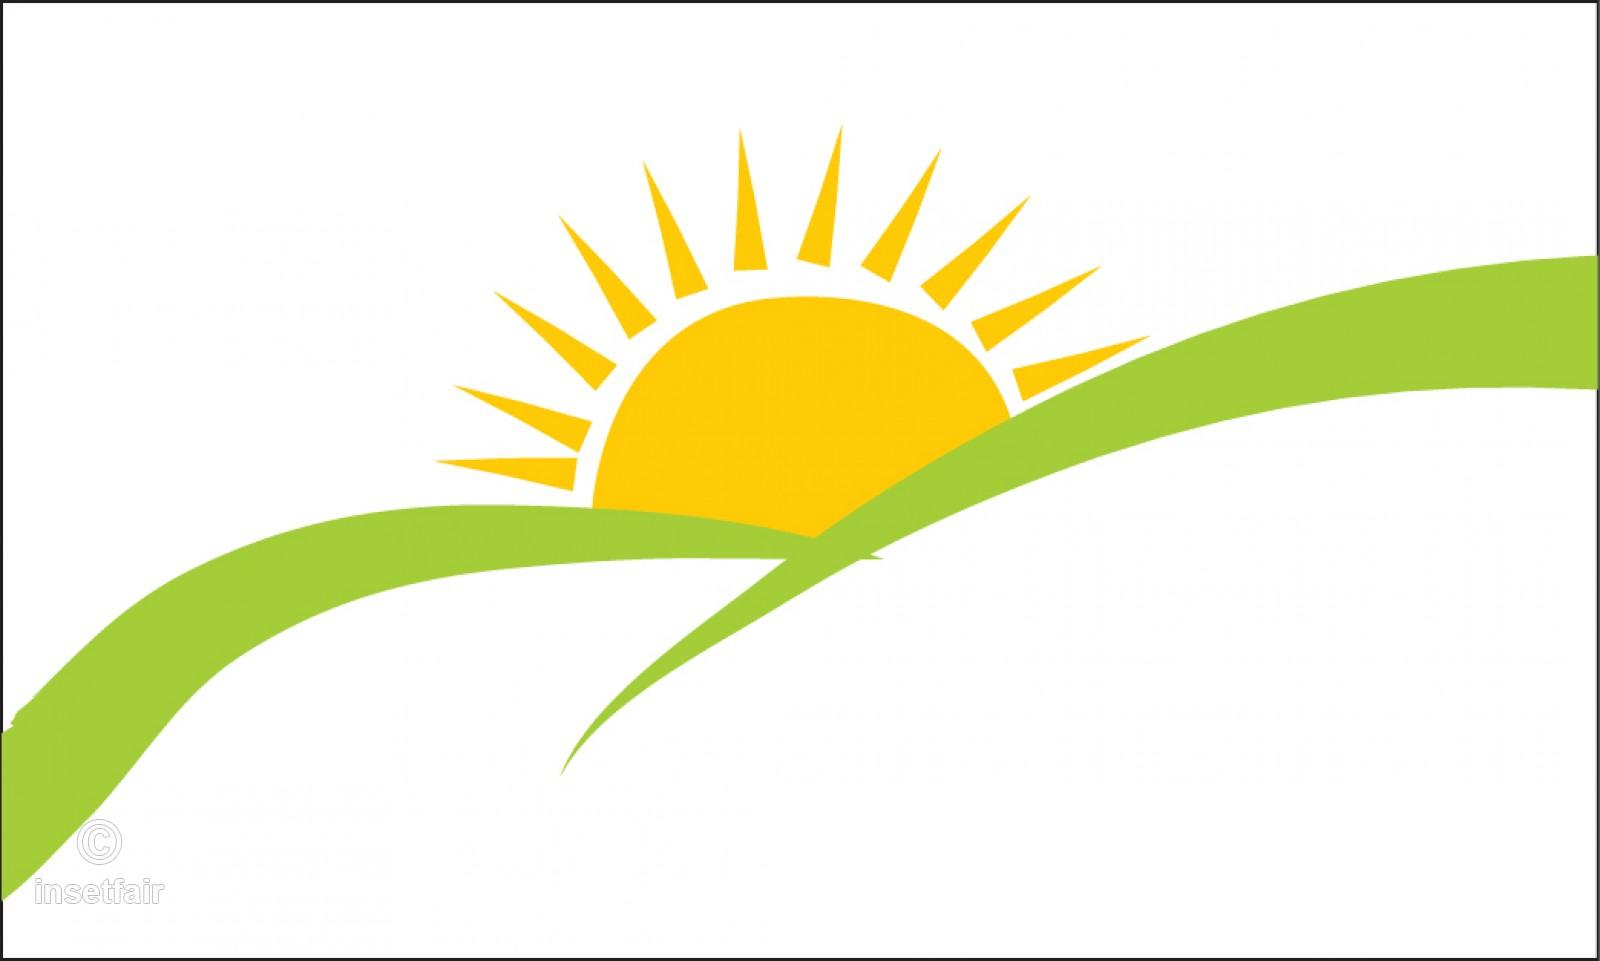 1600x961 ideas sunrise logo clip art sunrise vector drawing represents logo